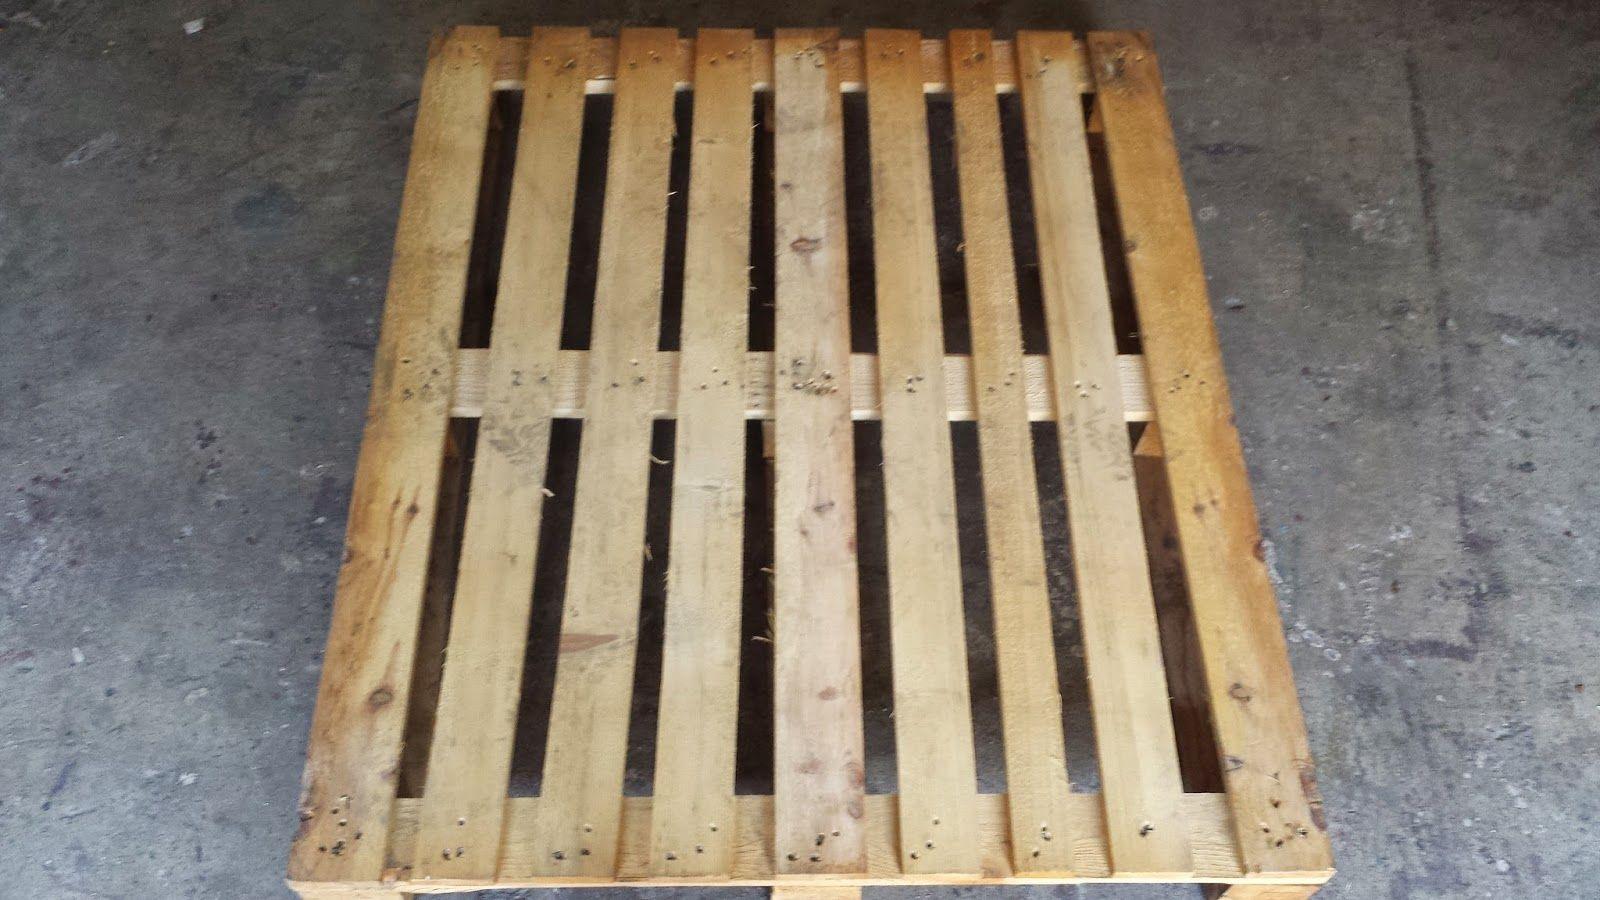 Pallet Kayu Murah Malaysia - Cheap Wooden Pallet Malaysia: Pallet ...